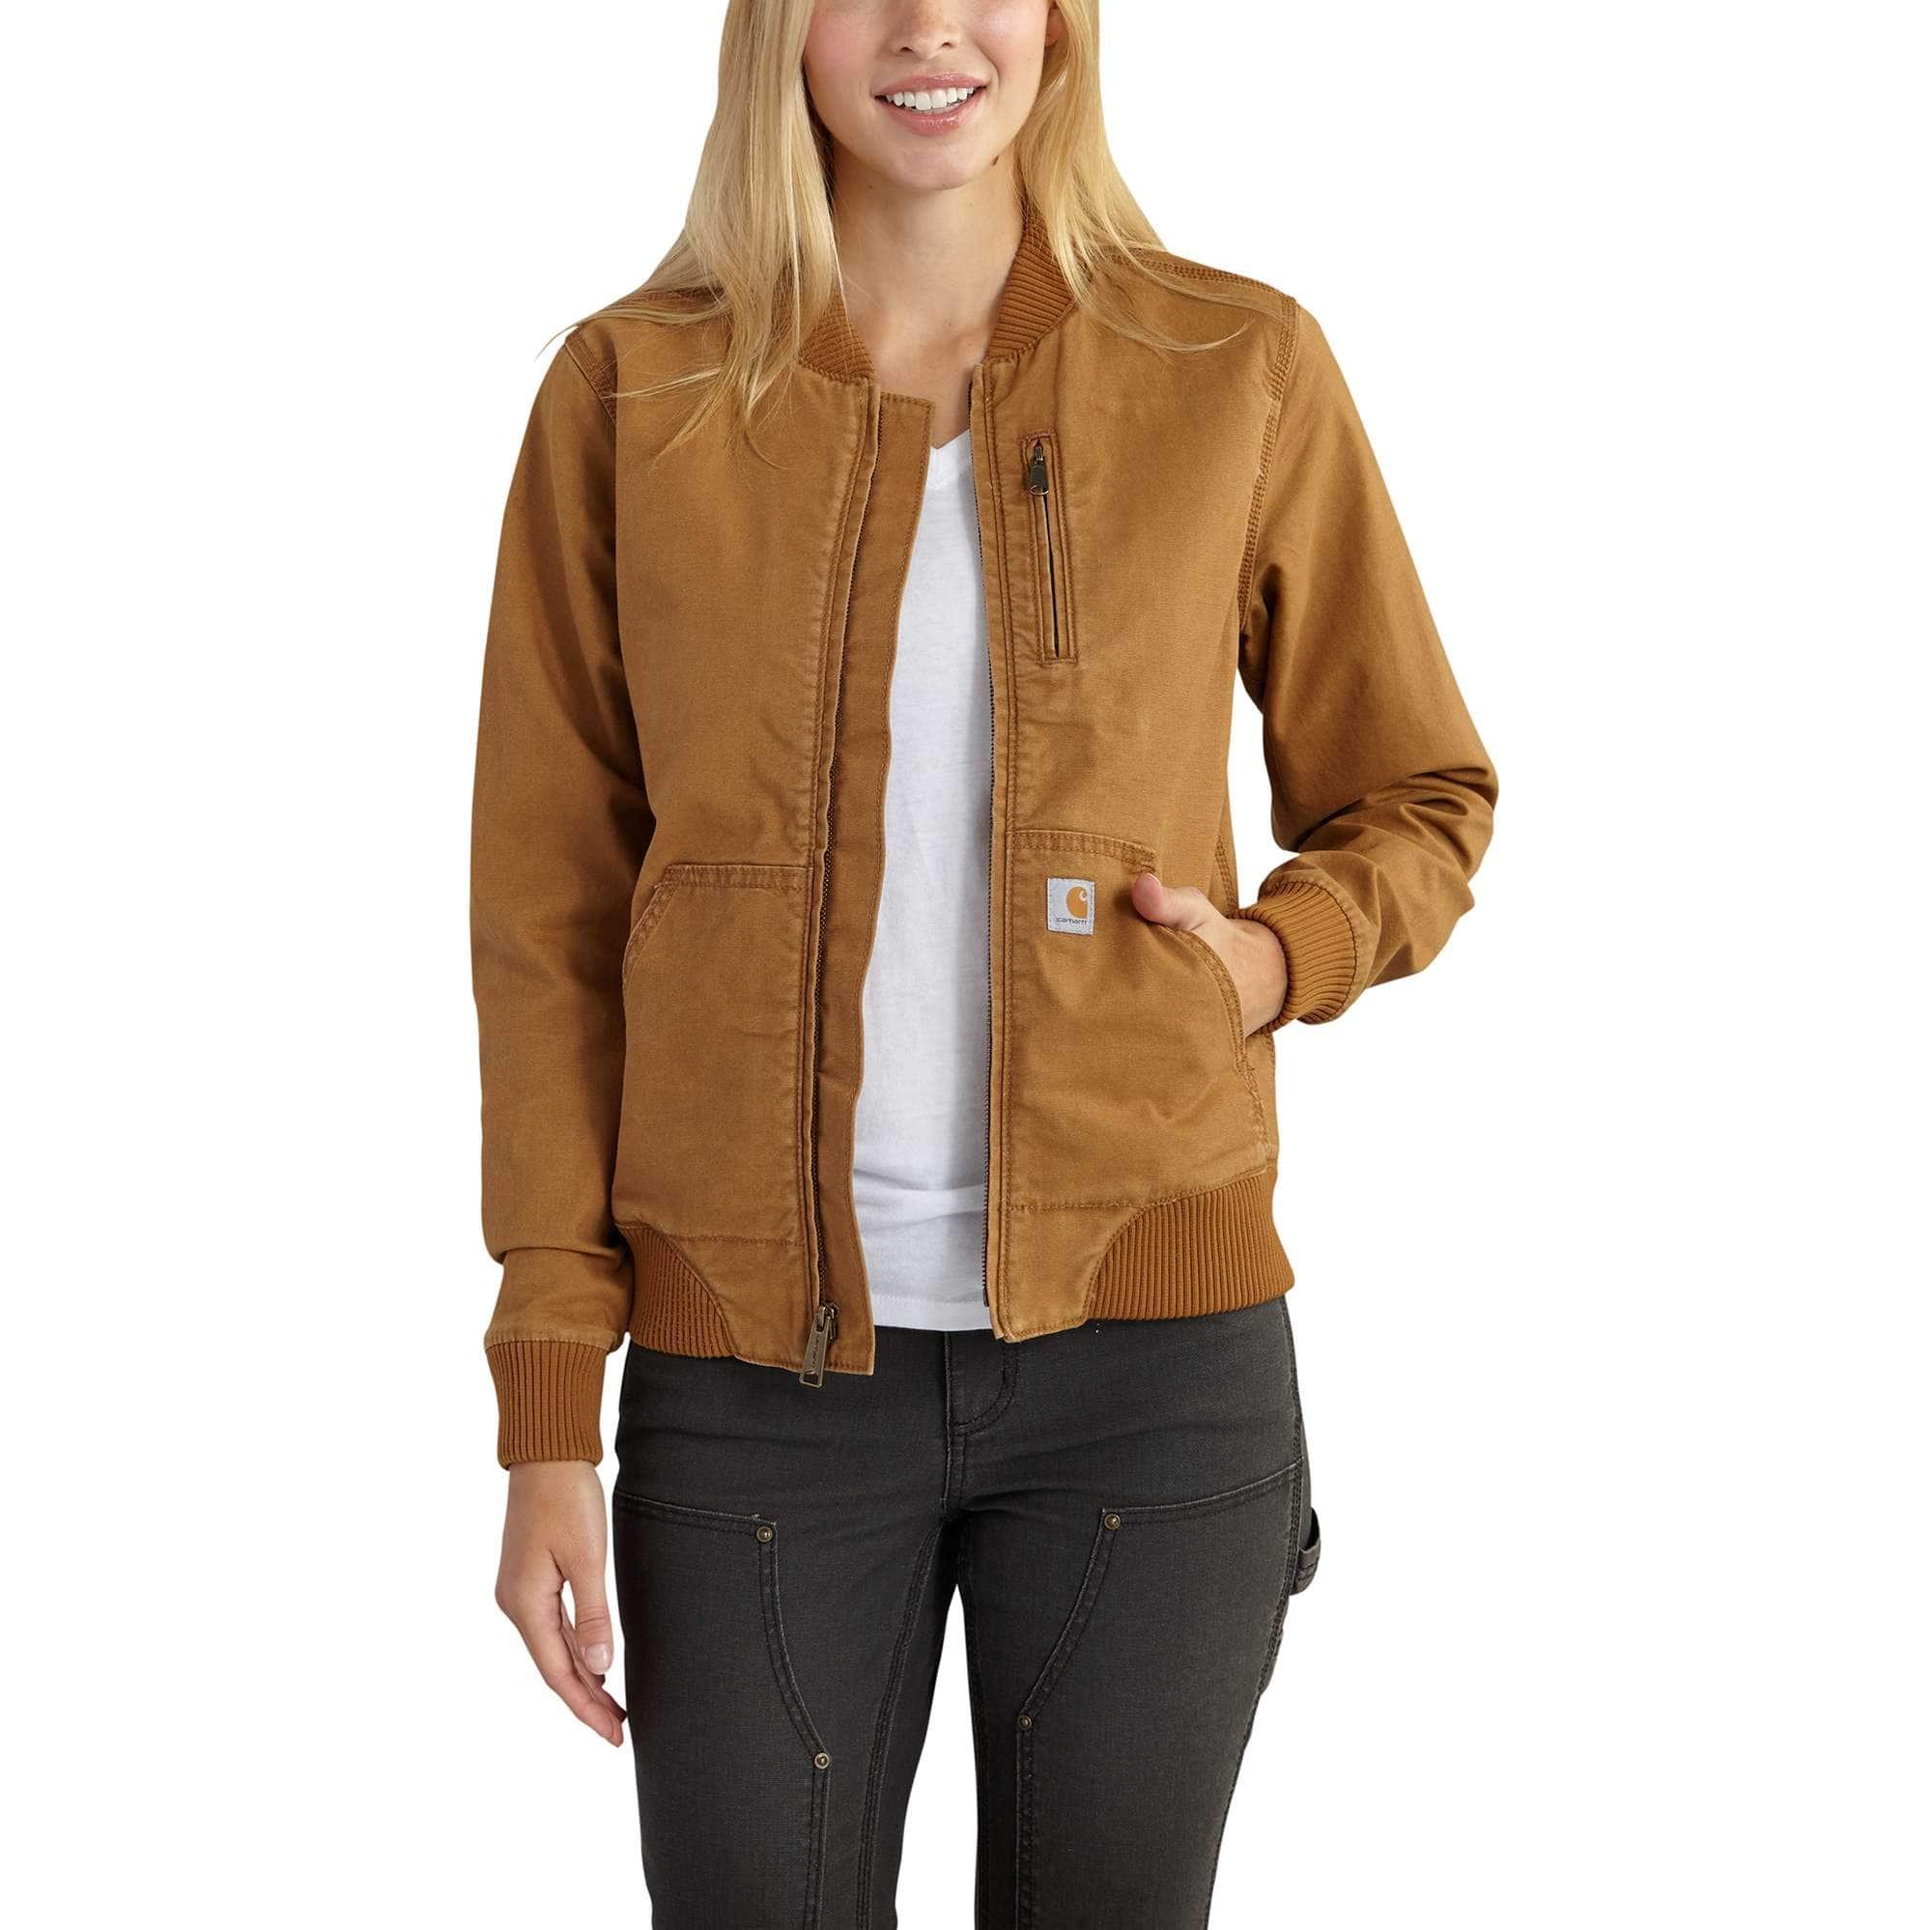 00bd701fc59 Women s Crawford Bomber Jacket 102524